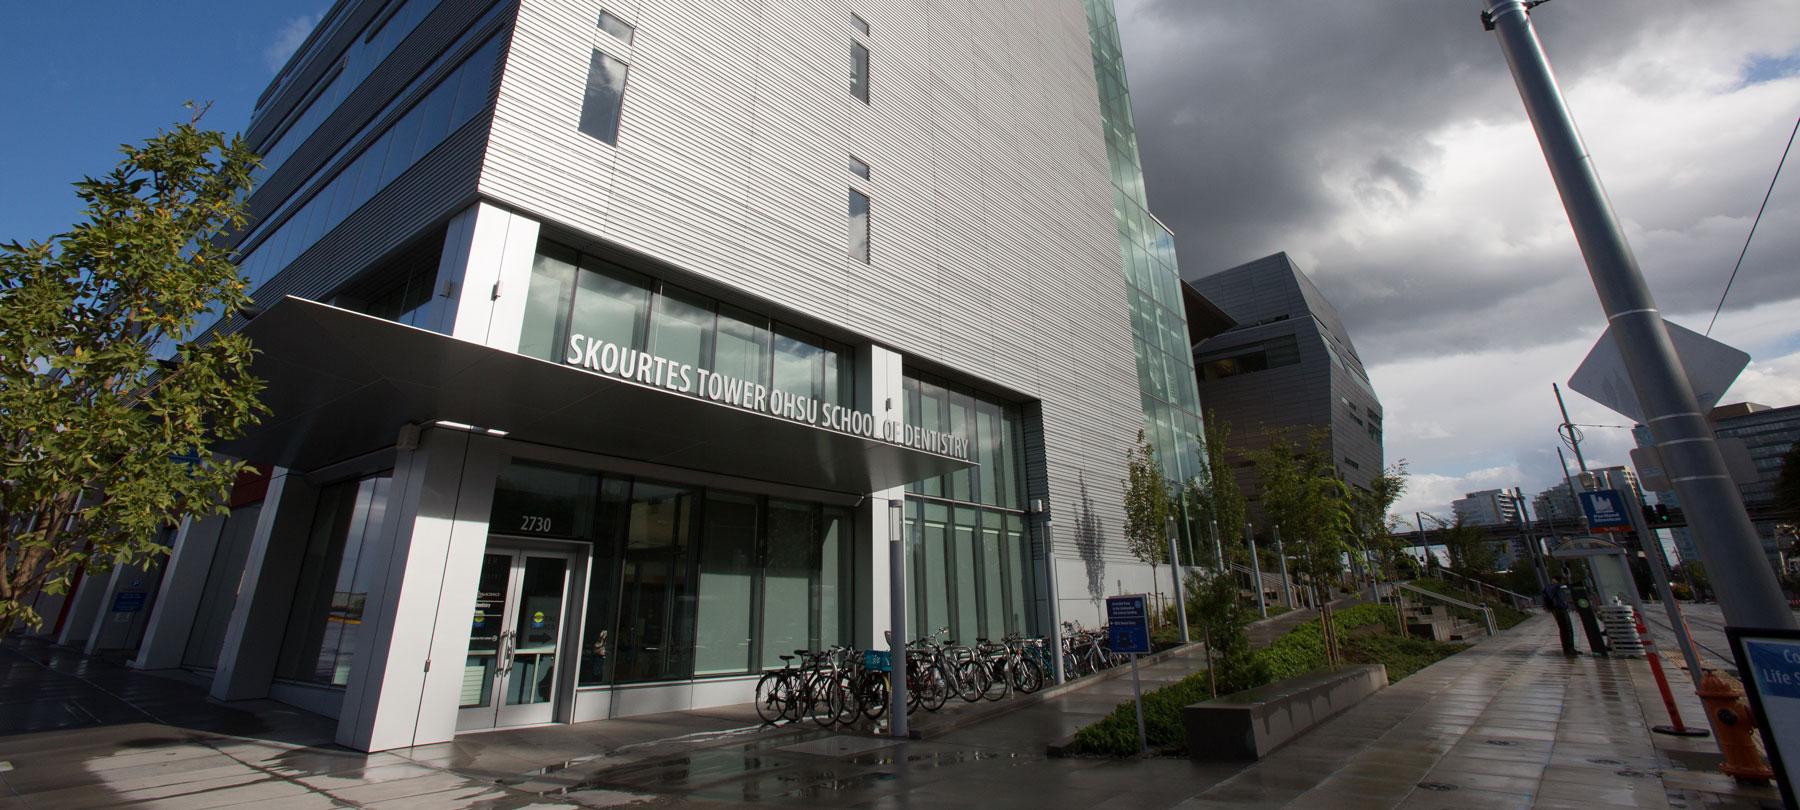 Skourtes Tower, OHSU School of Dentistry